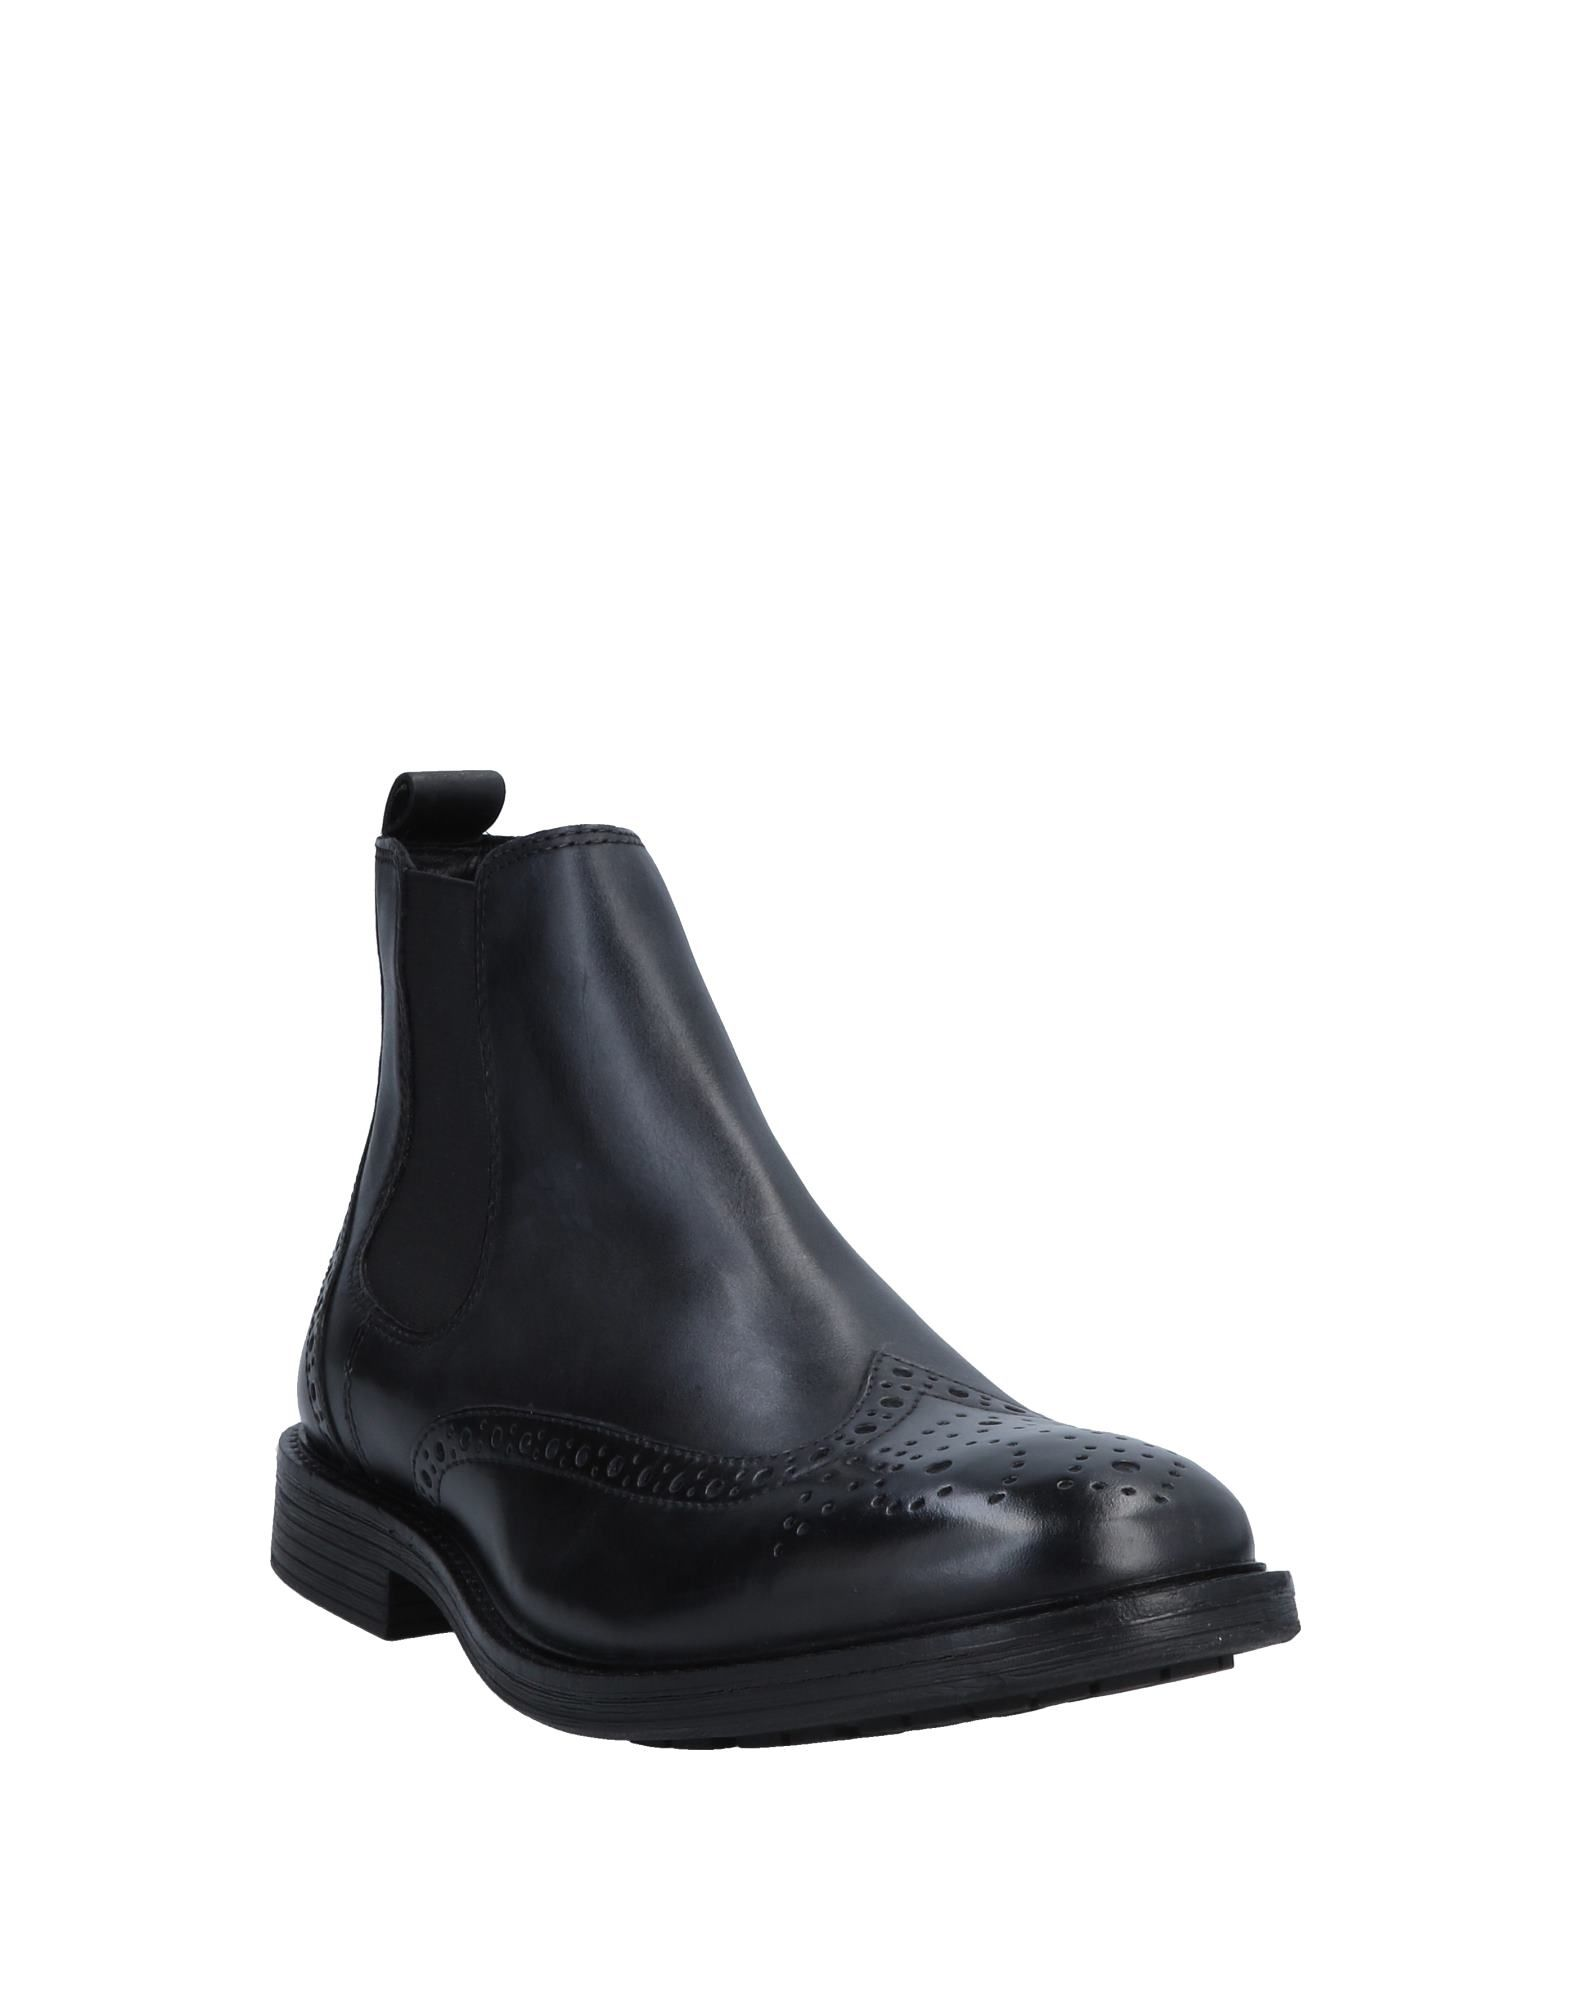 Lumberjack Boots - - - Men Lumberjack Boots online on  United Kingdom - 11570006WC cba6cf